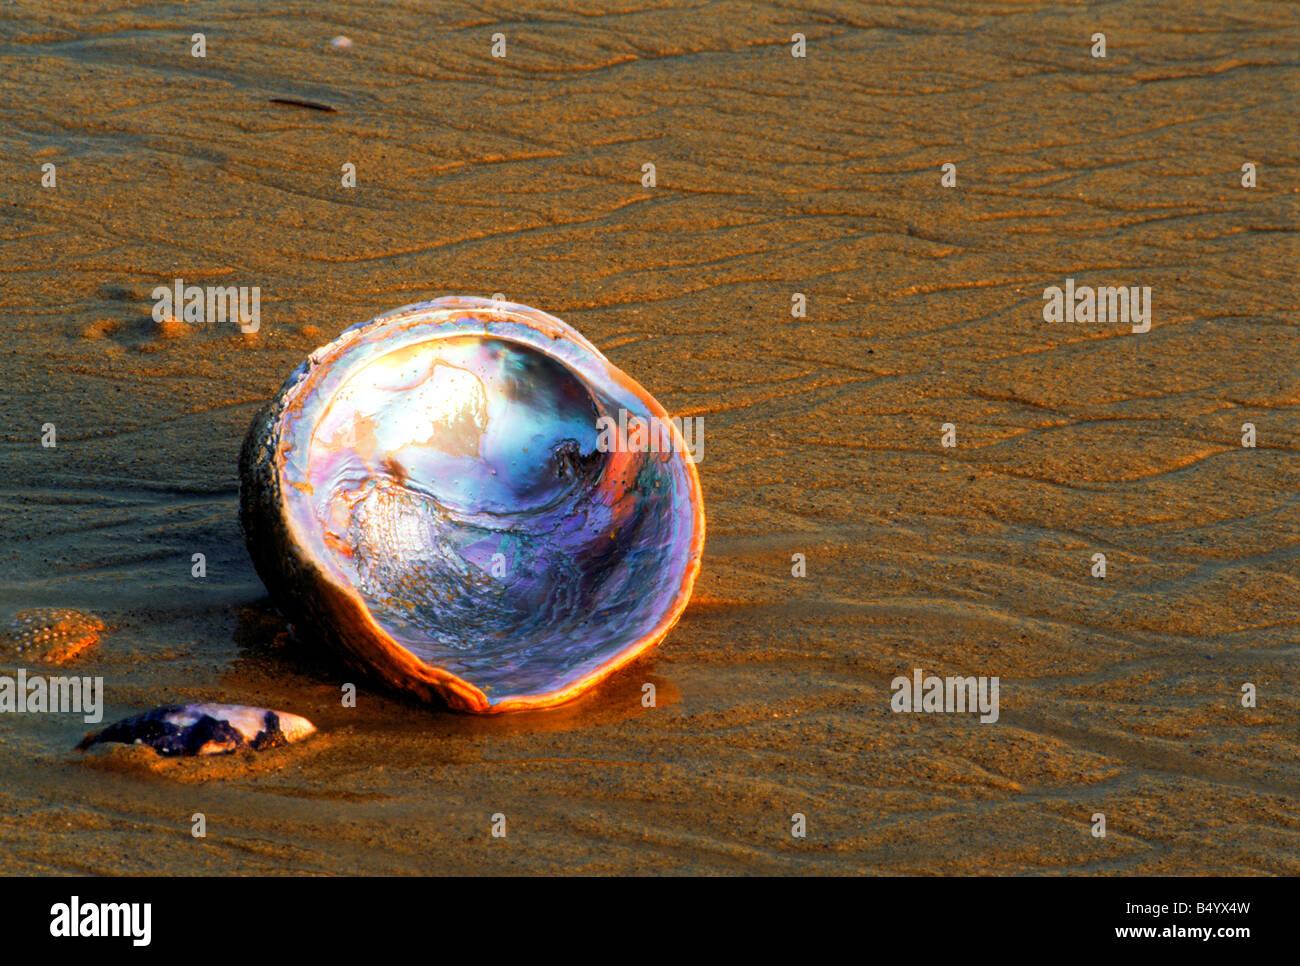 Abalone shell Haliotis iris on sandy shore - Stock Image